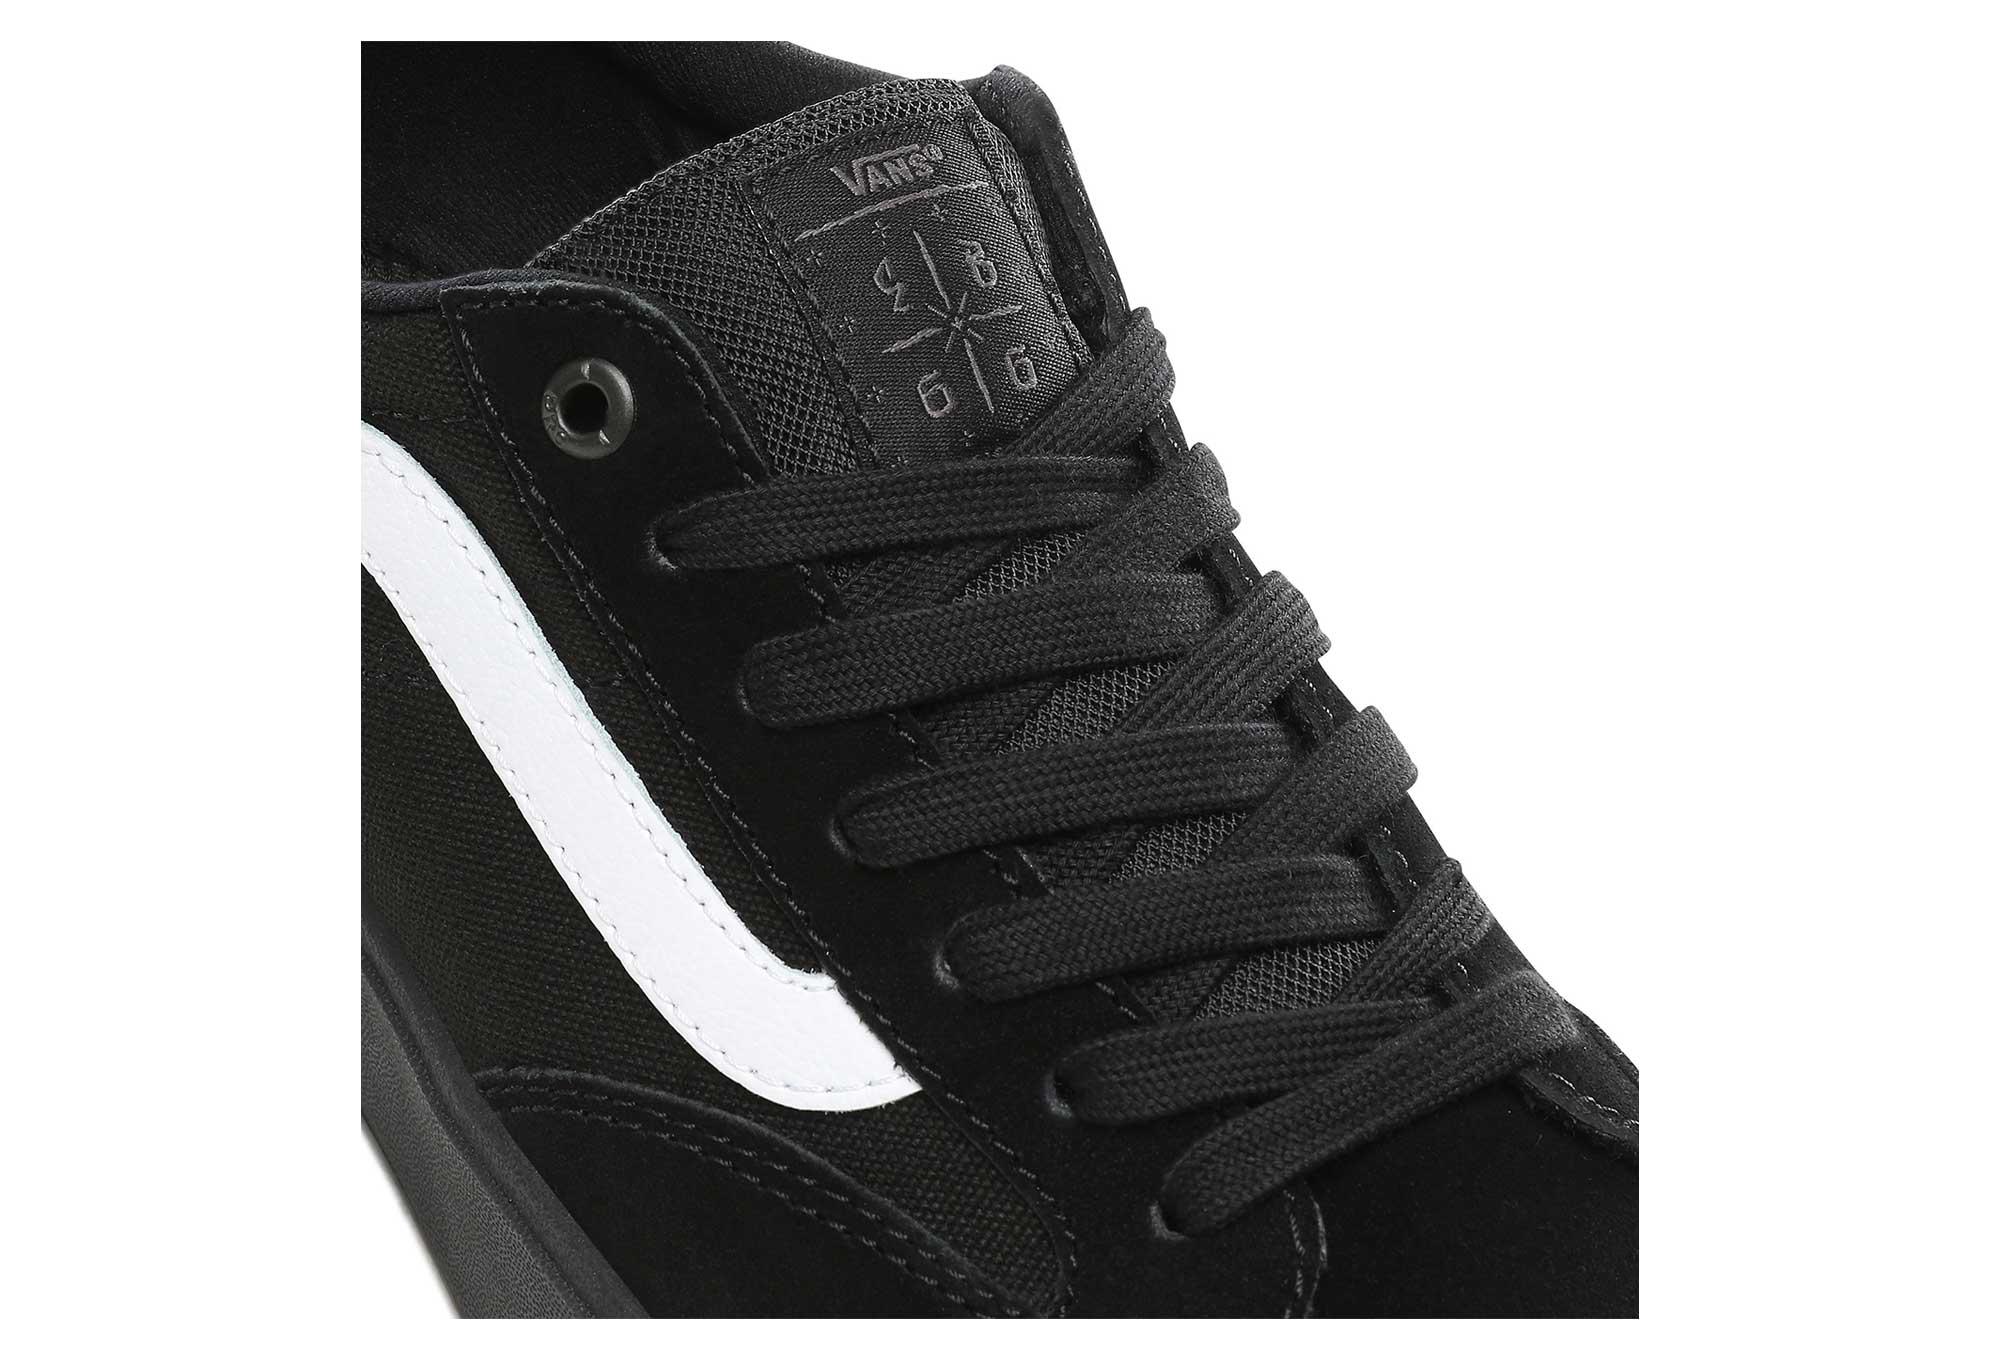 Chaussures Vans Berle Pro Noir Blanc